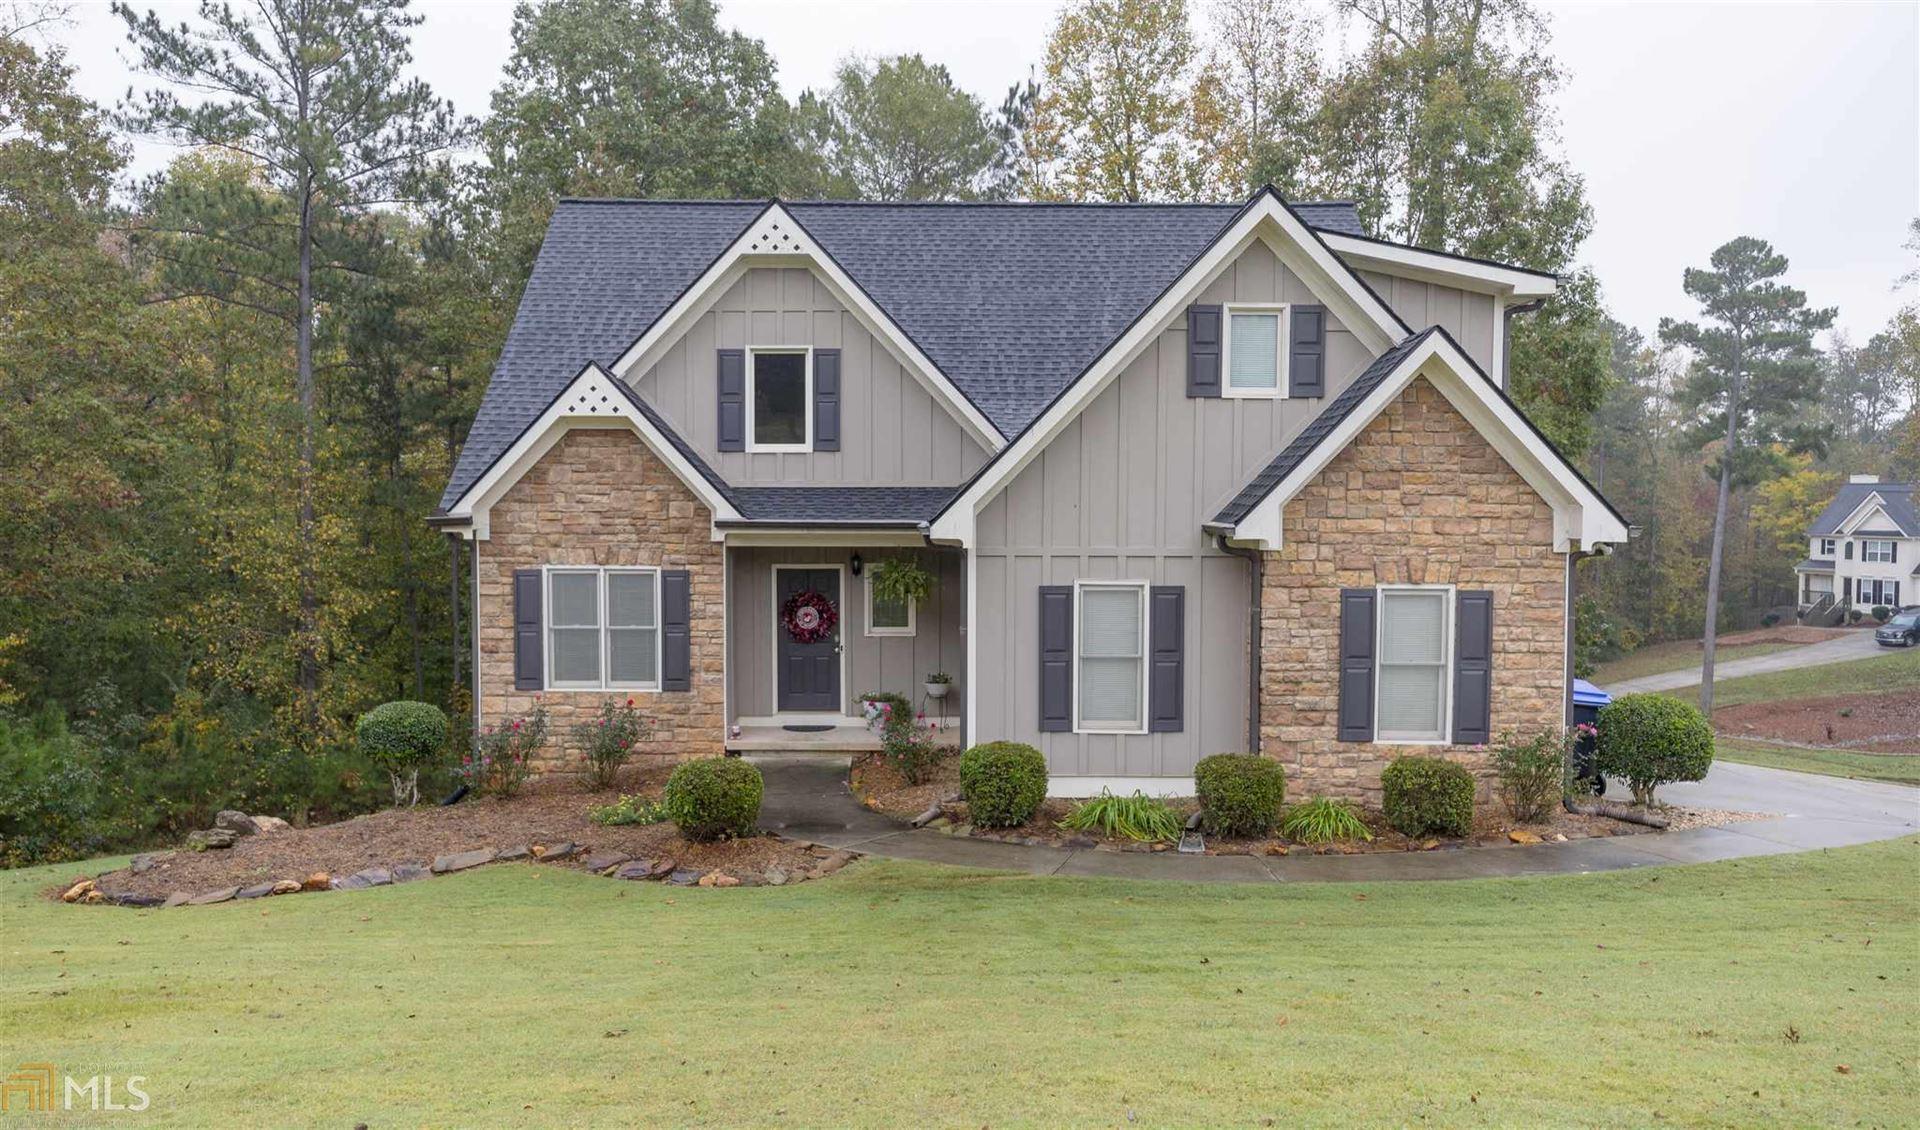 6186 Weathered Stone Ct, Douglasville, GA 30135 - #: 8885998